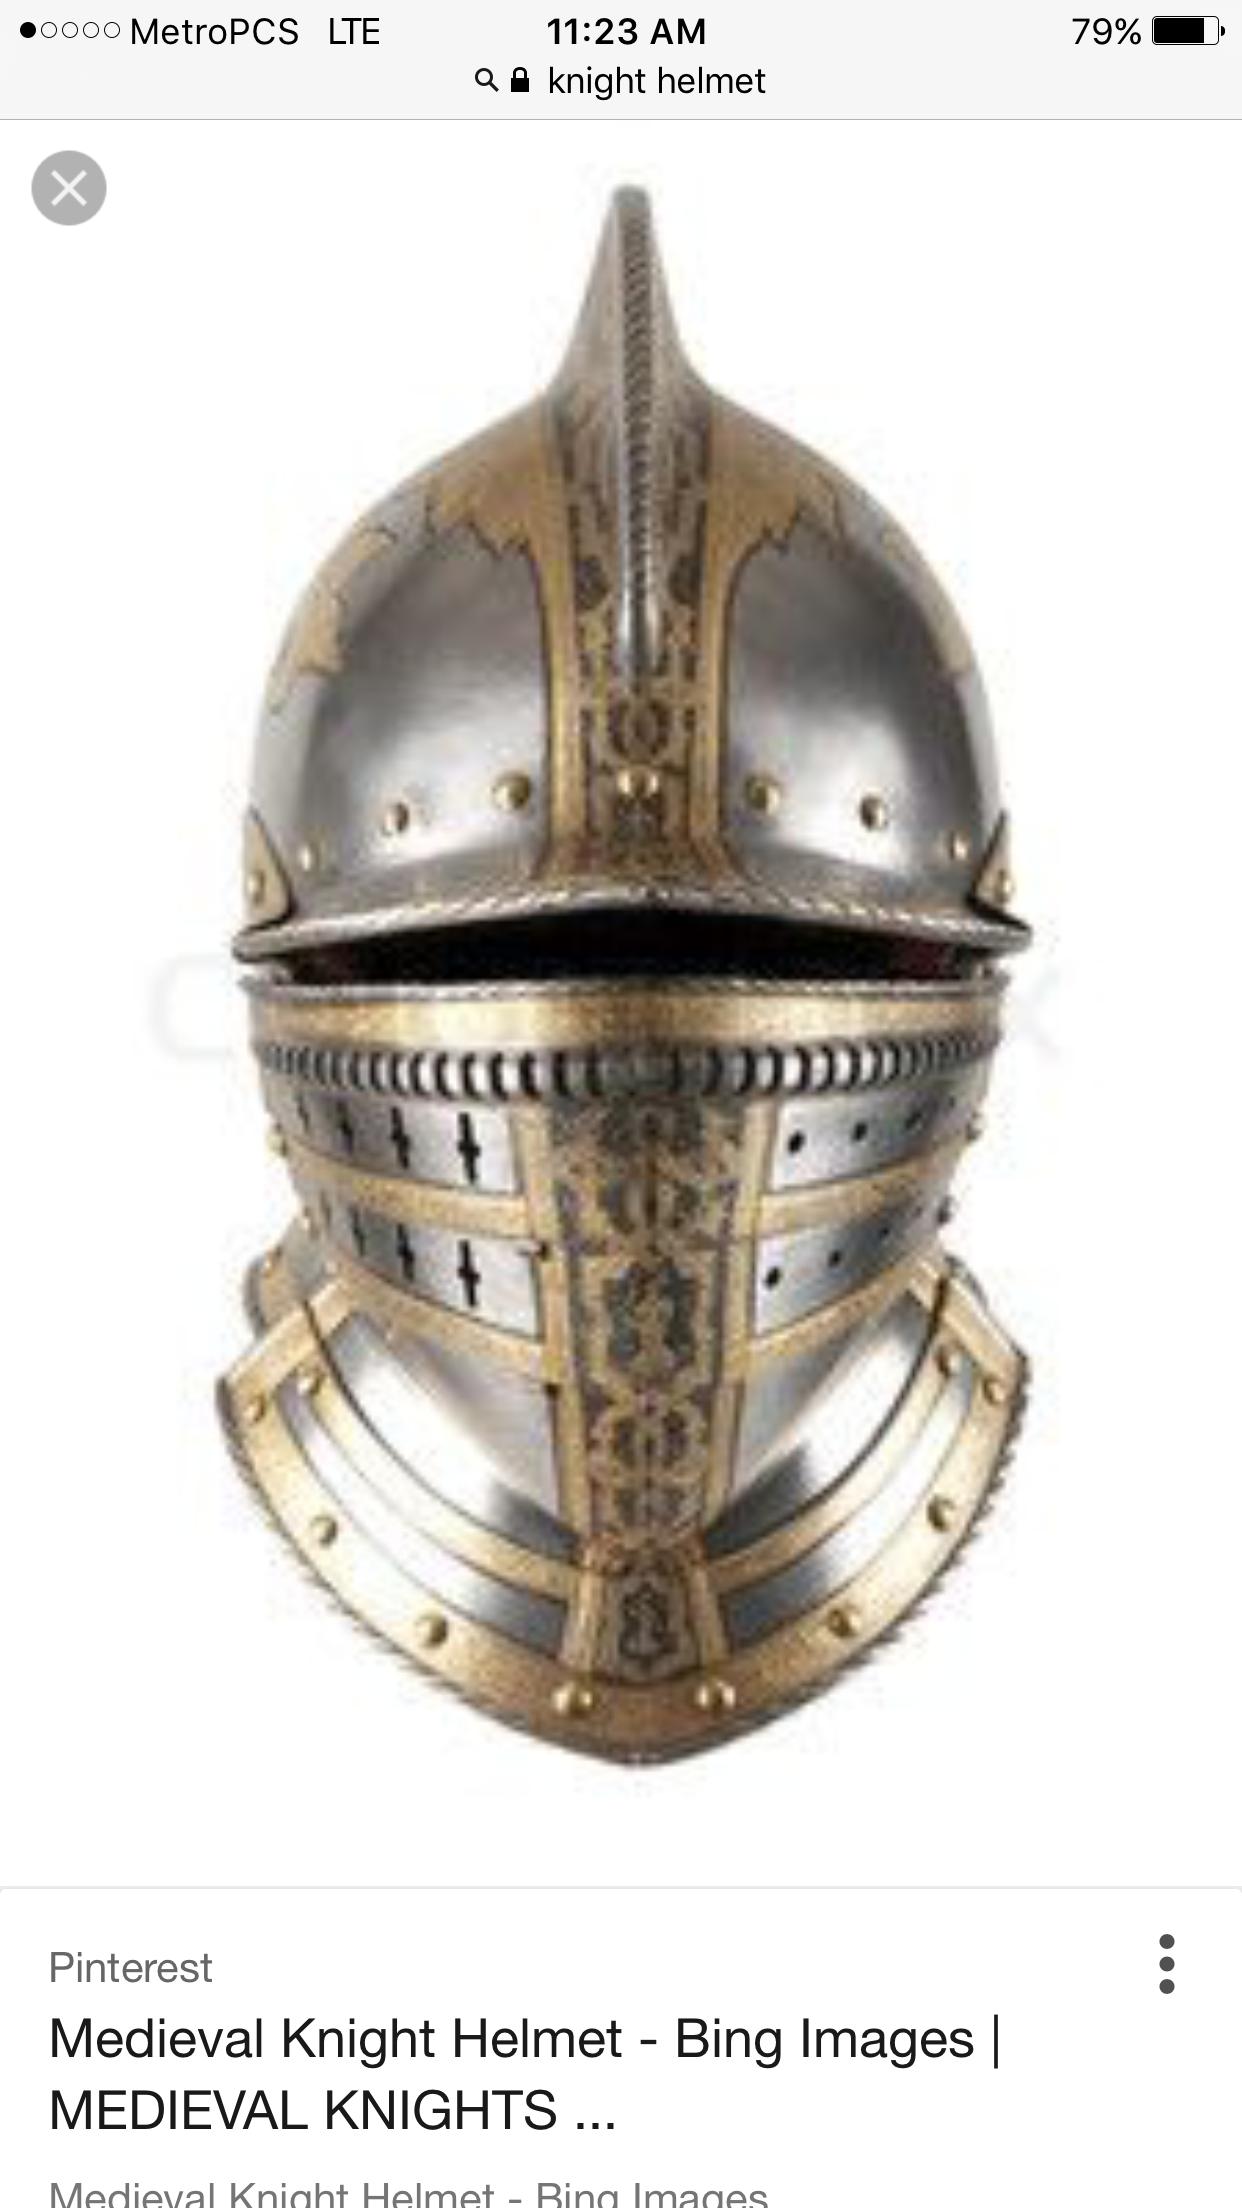 Pin By Orion Melton On Macduff Medieval Knight Helmet Helmet Armor